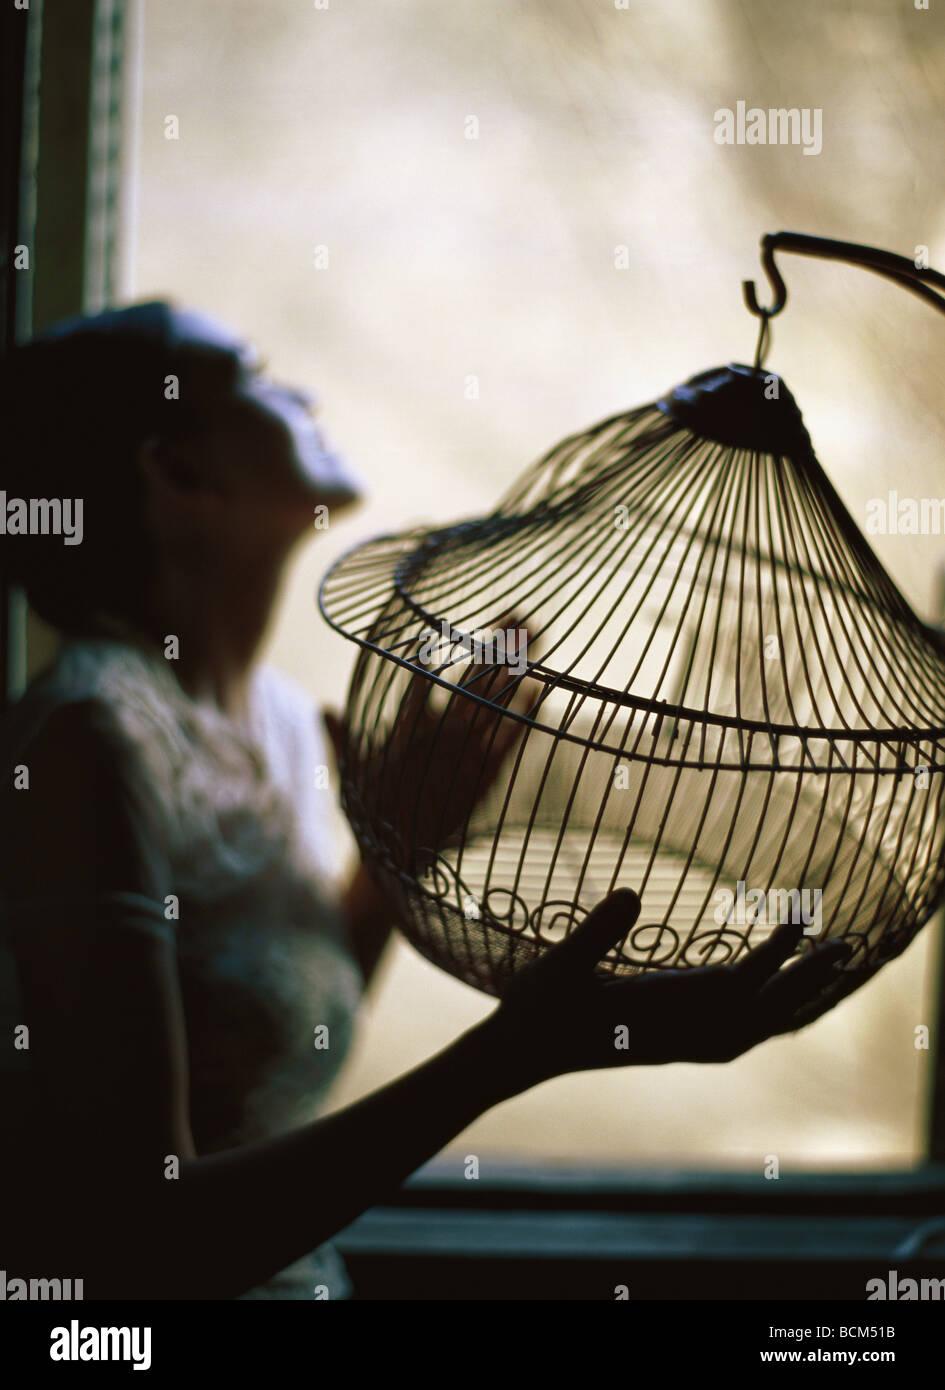 Woman standing beside window, holding empty birdcage - Stock Image